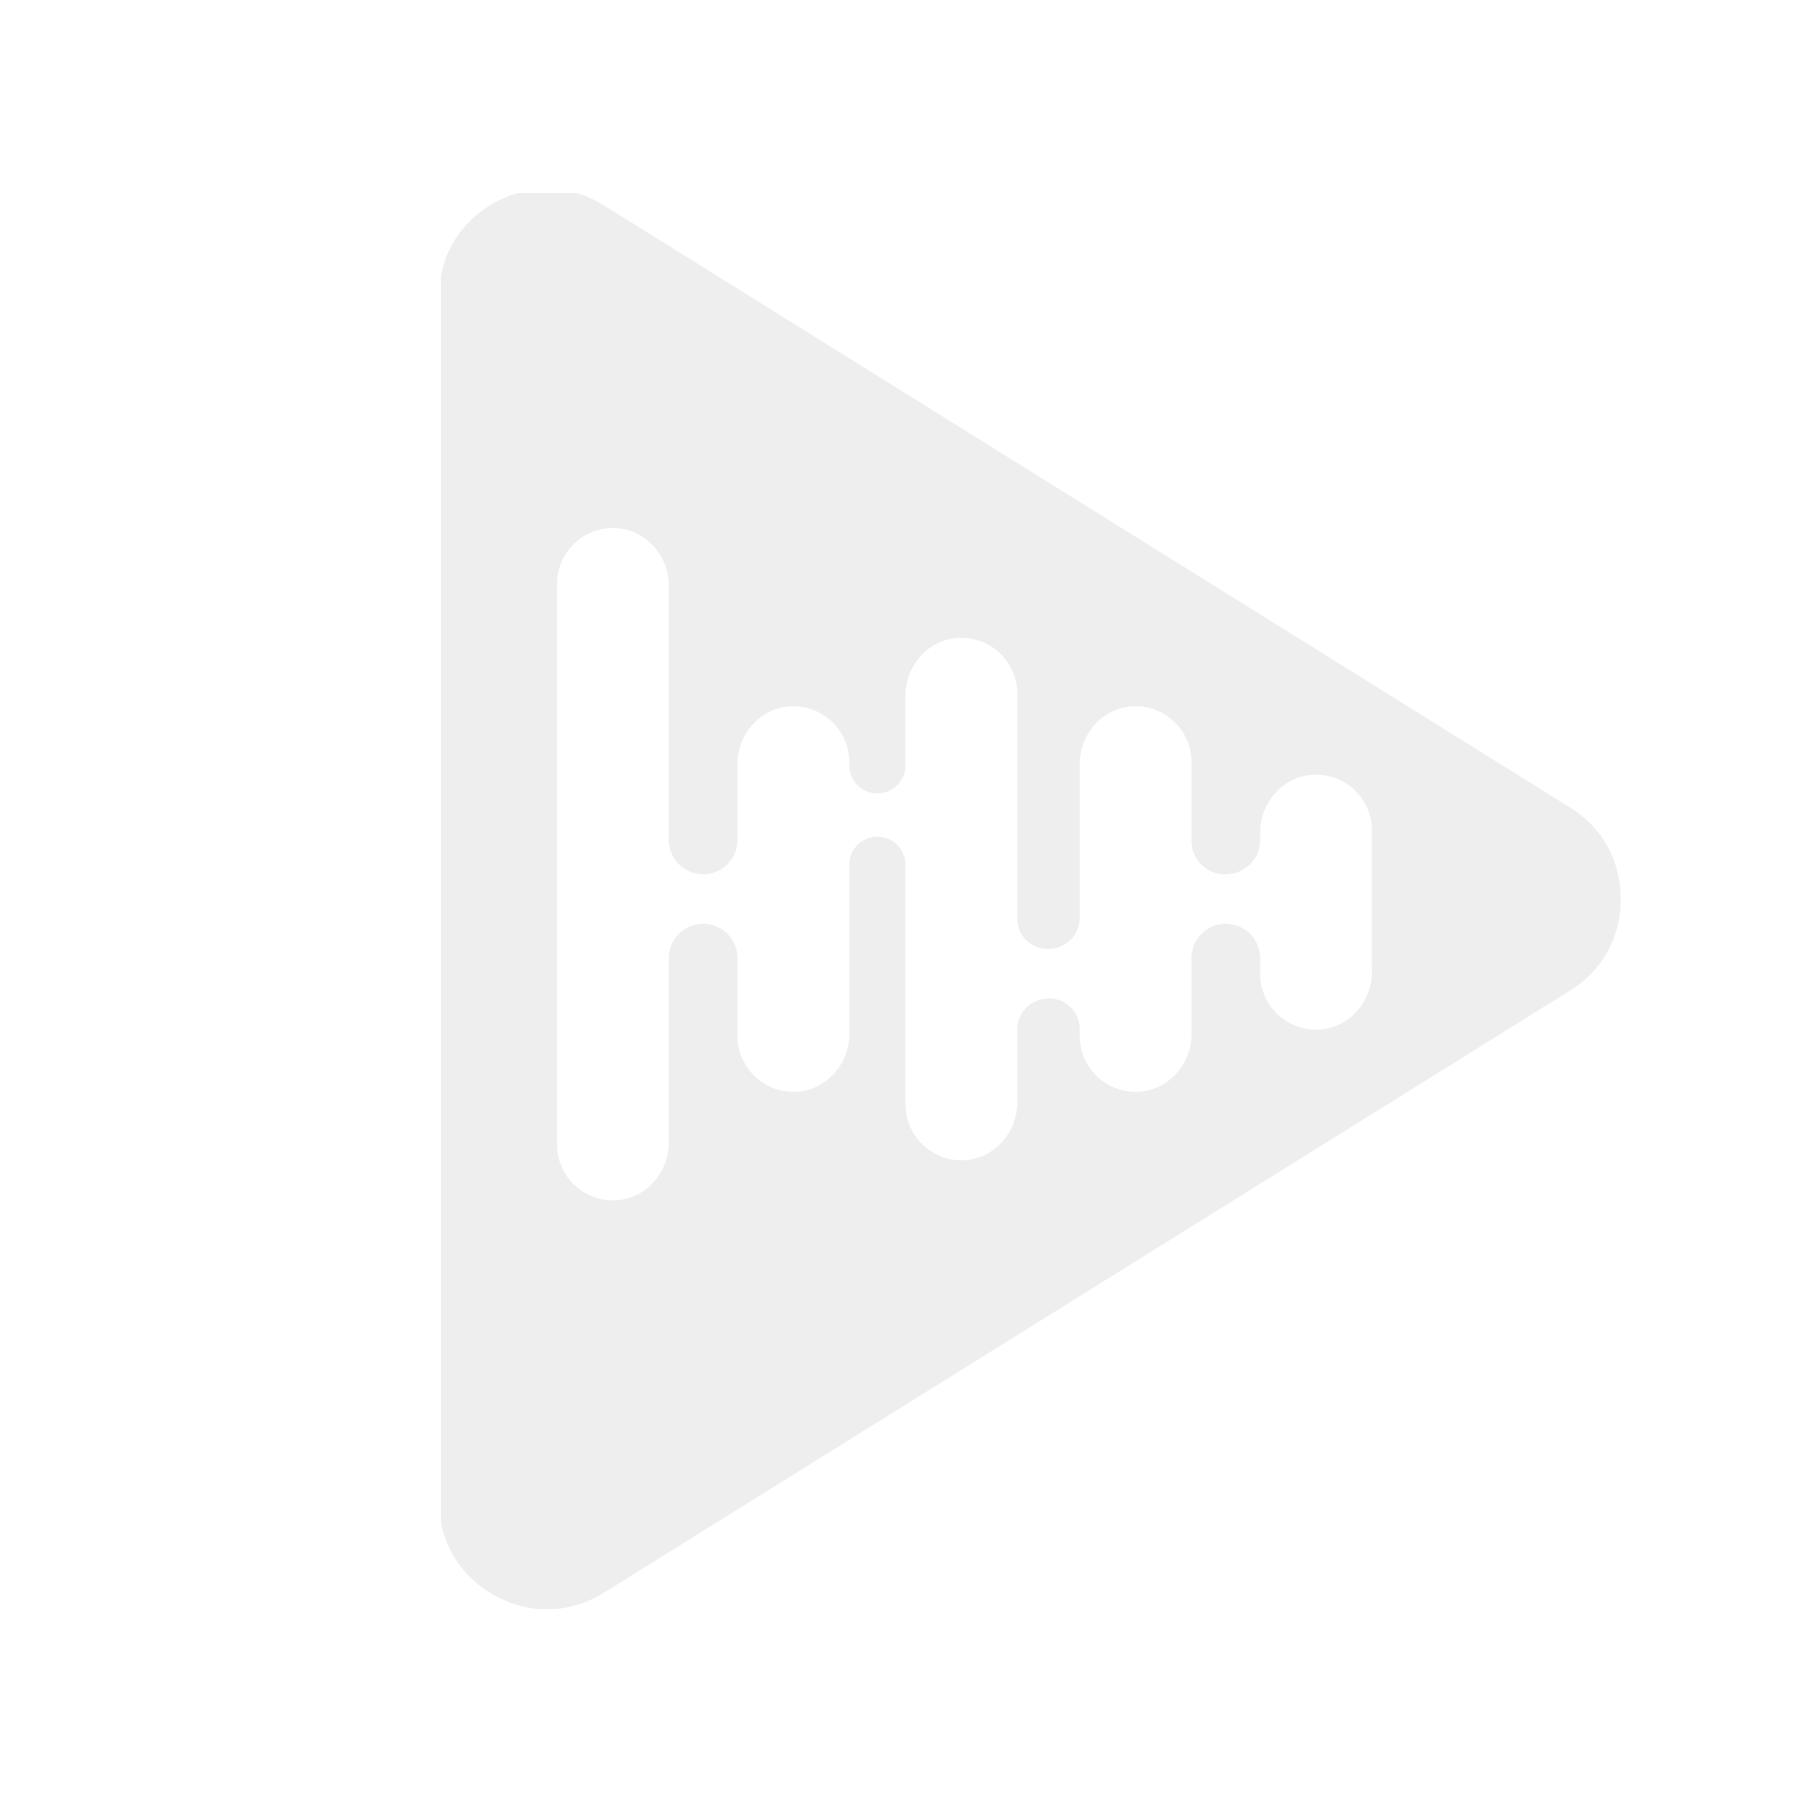 Skoddejuice Apple Fuji Aroma